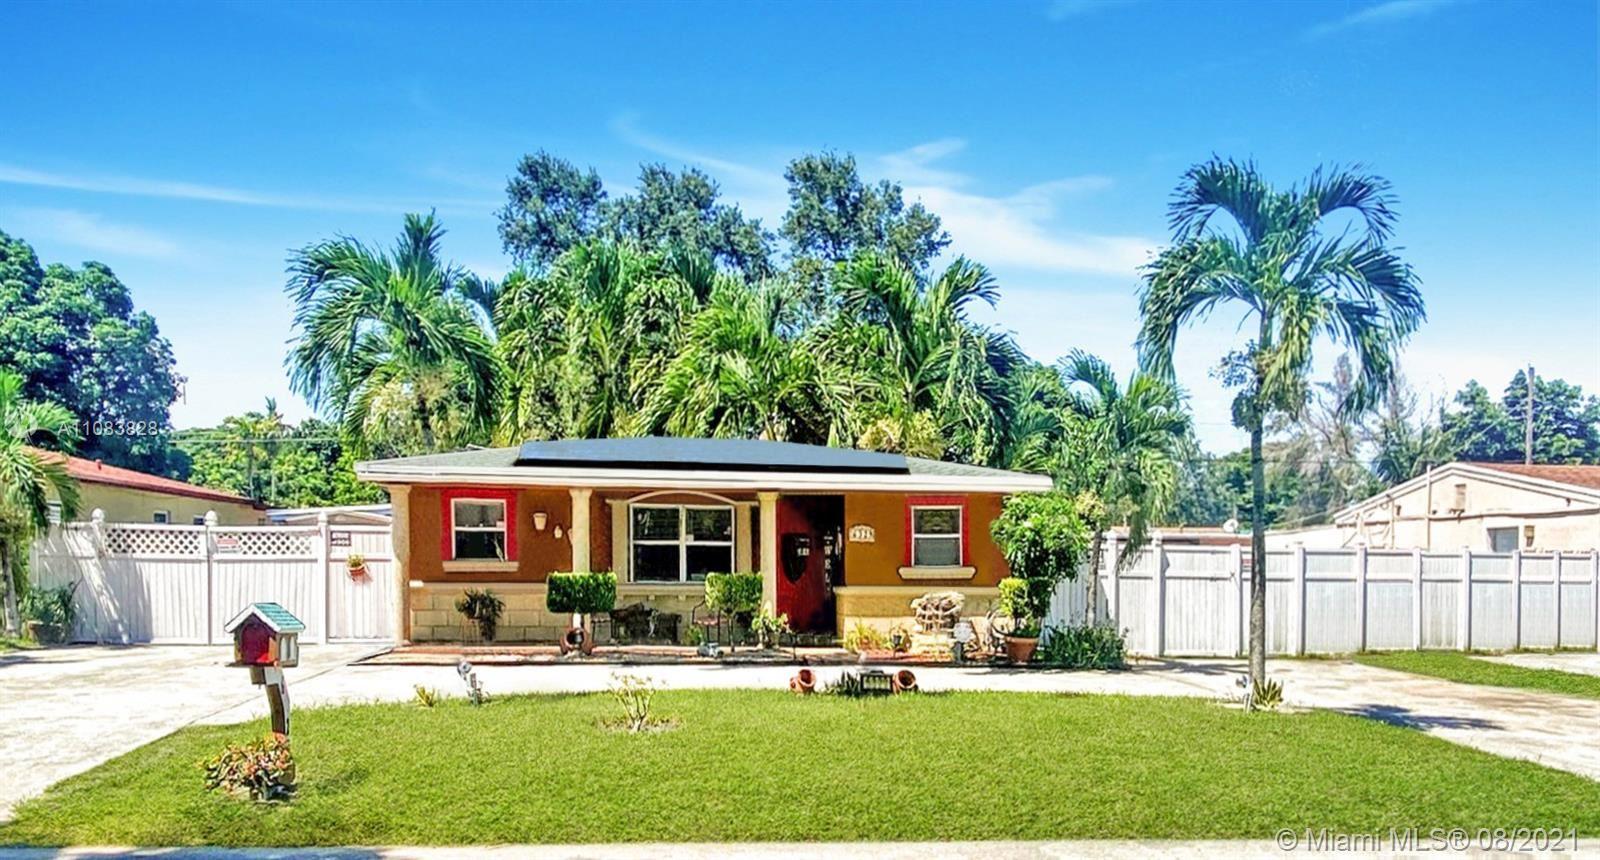 6329 Fletcher St, Hollywood, FL 33023 - #: A11083828